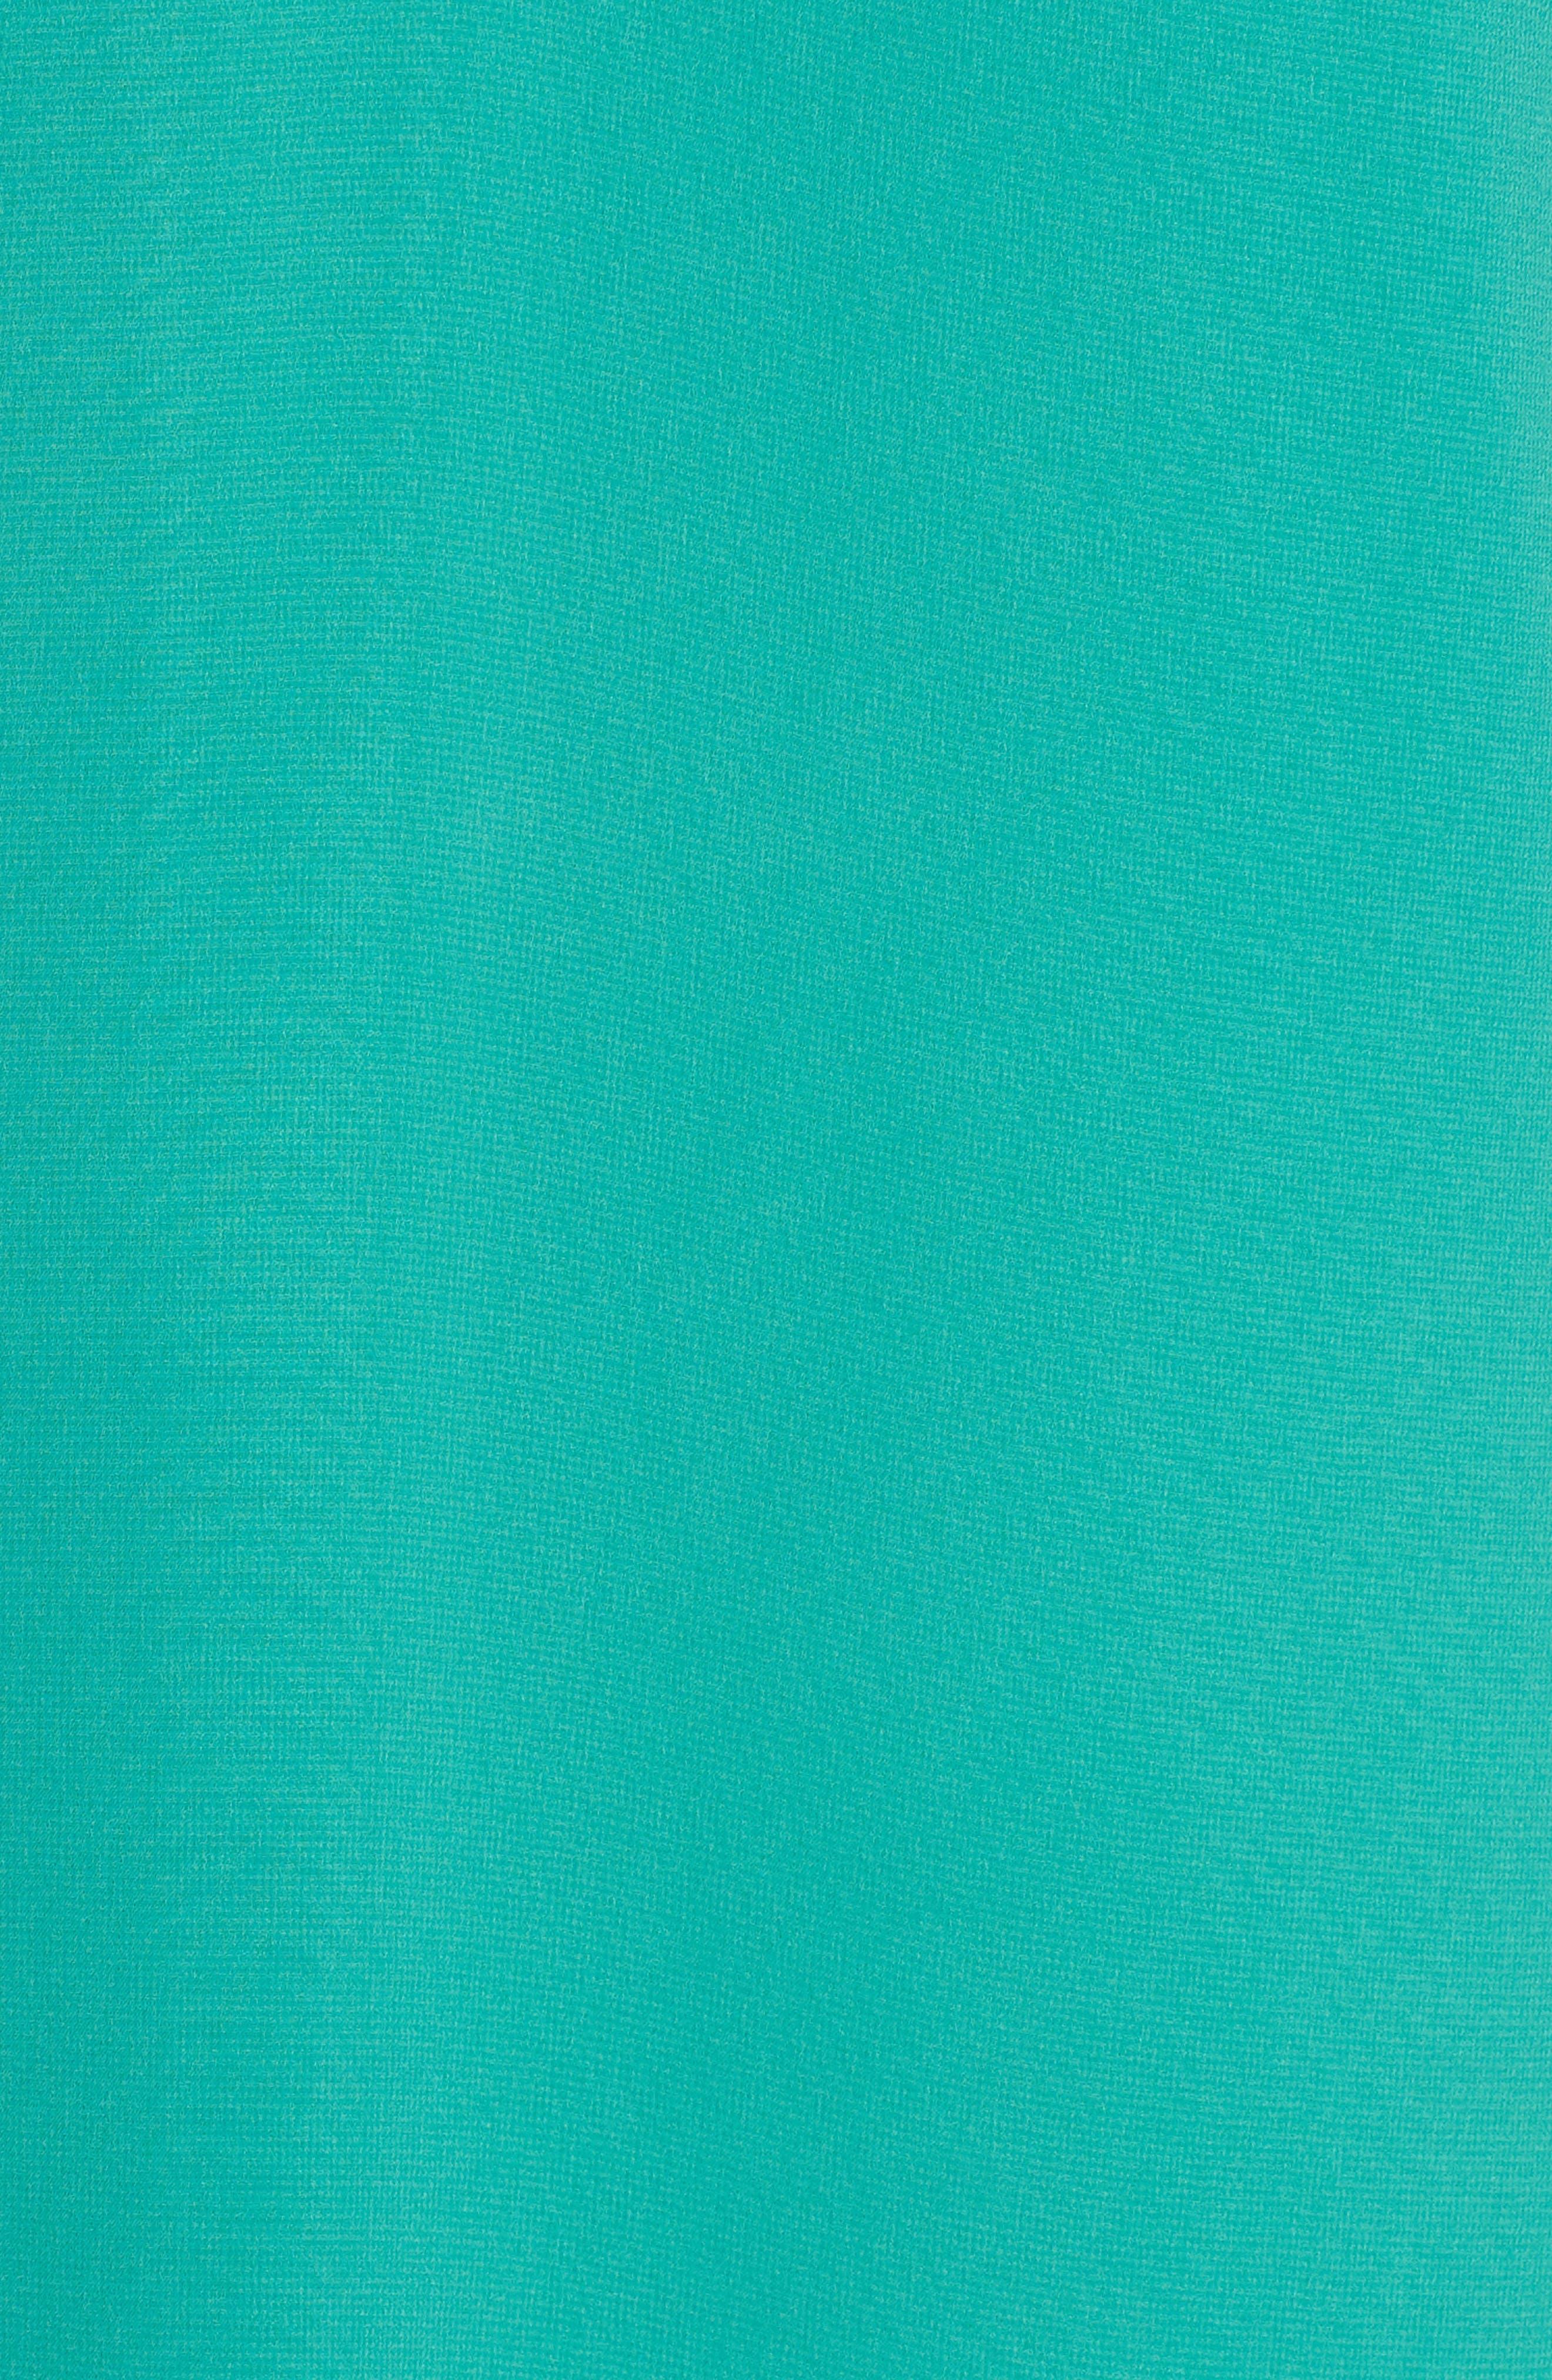 Pleat Sleeve Shift Dress,                             Alternate thumbnail 6, color,                             Green